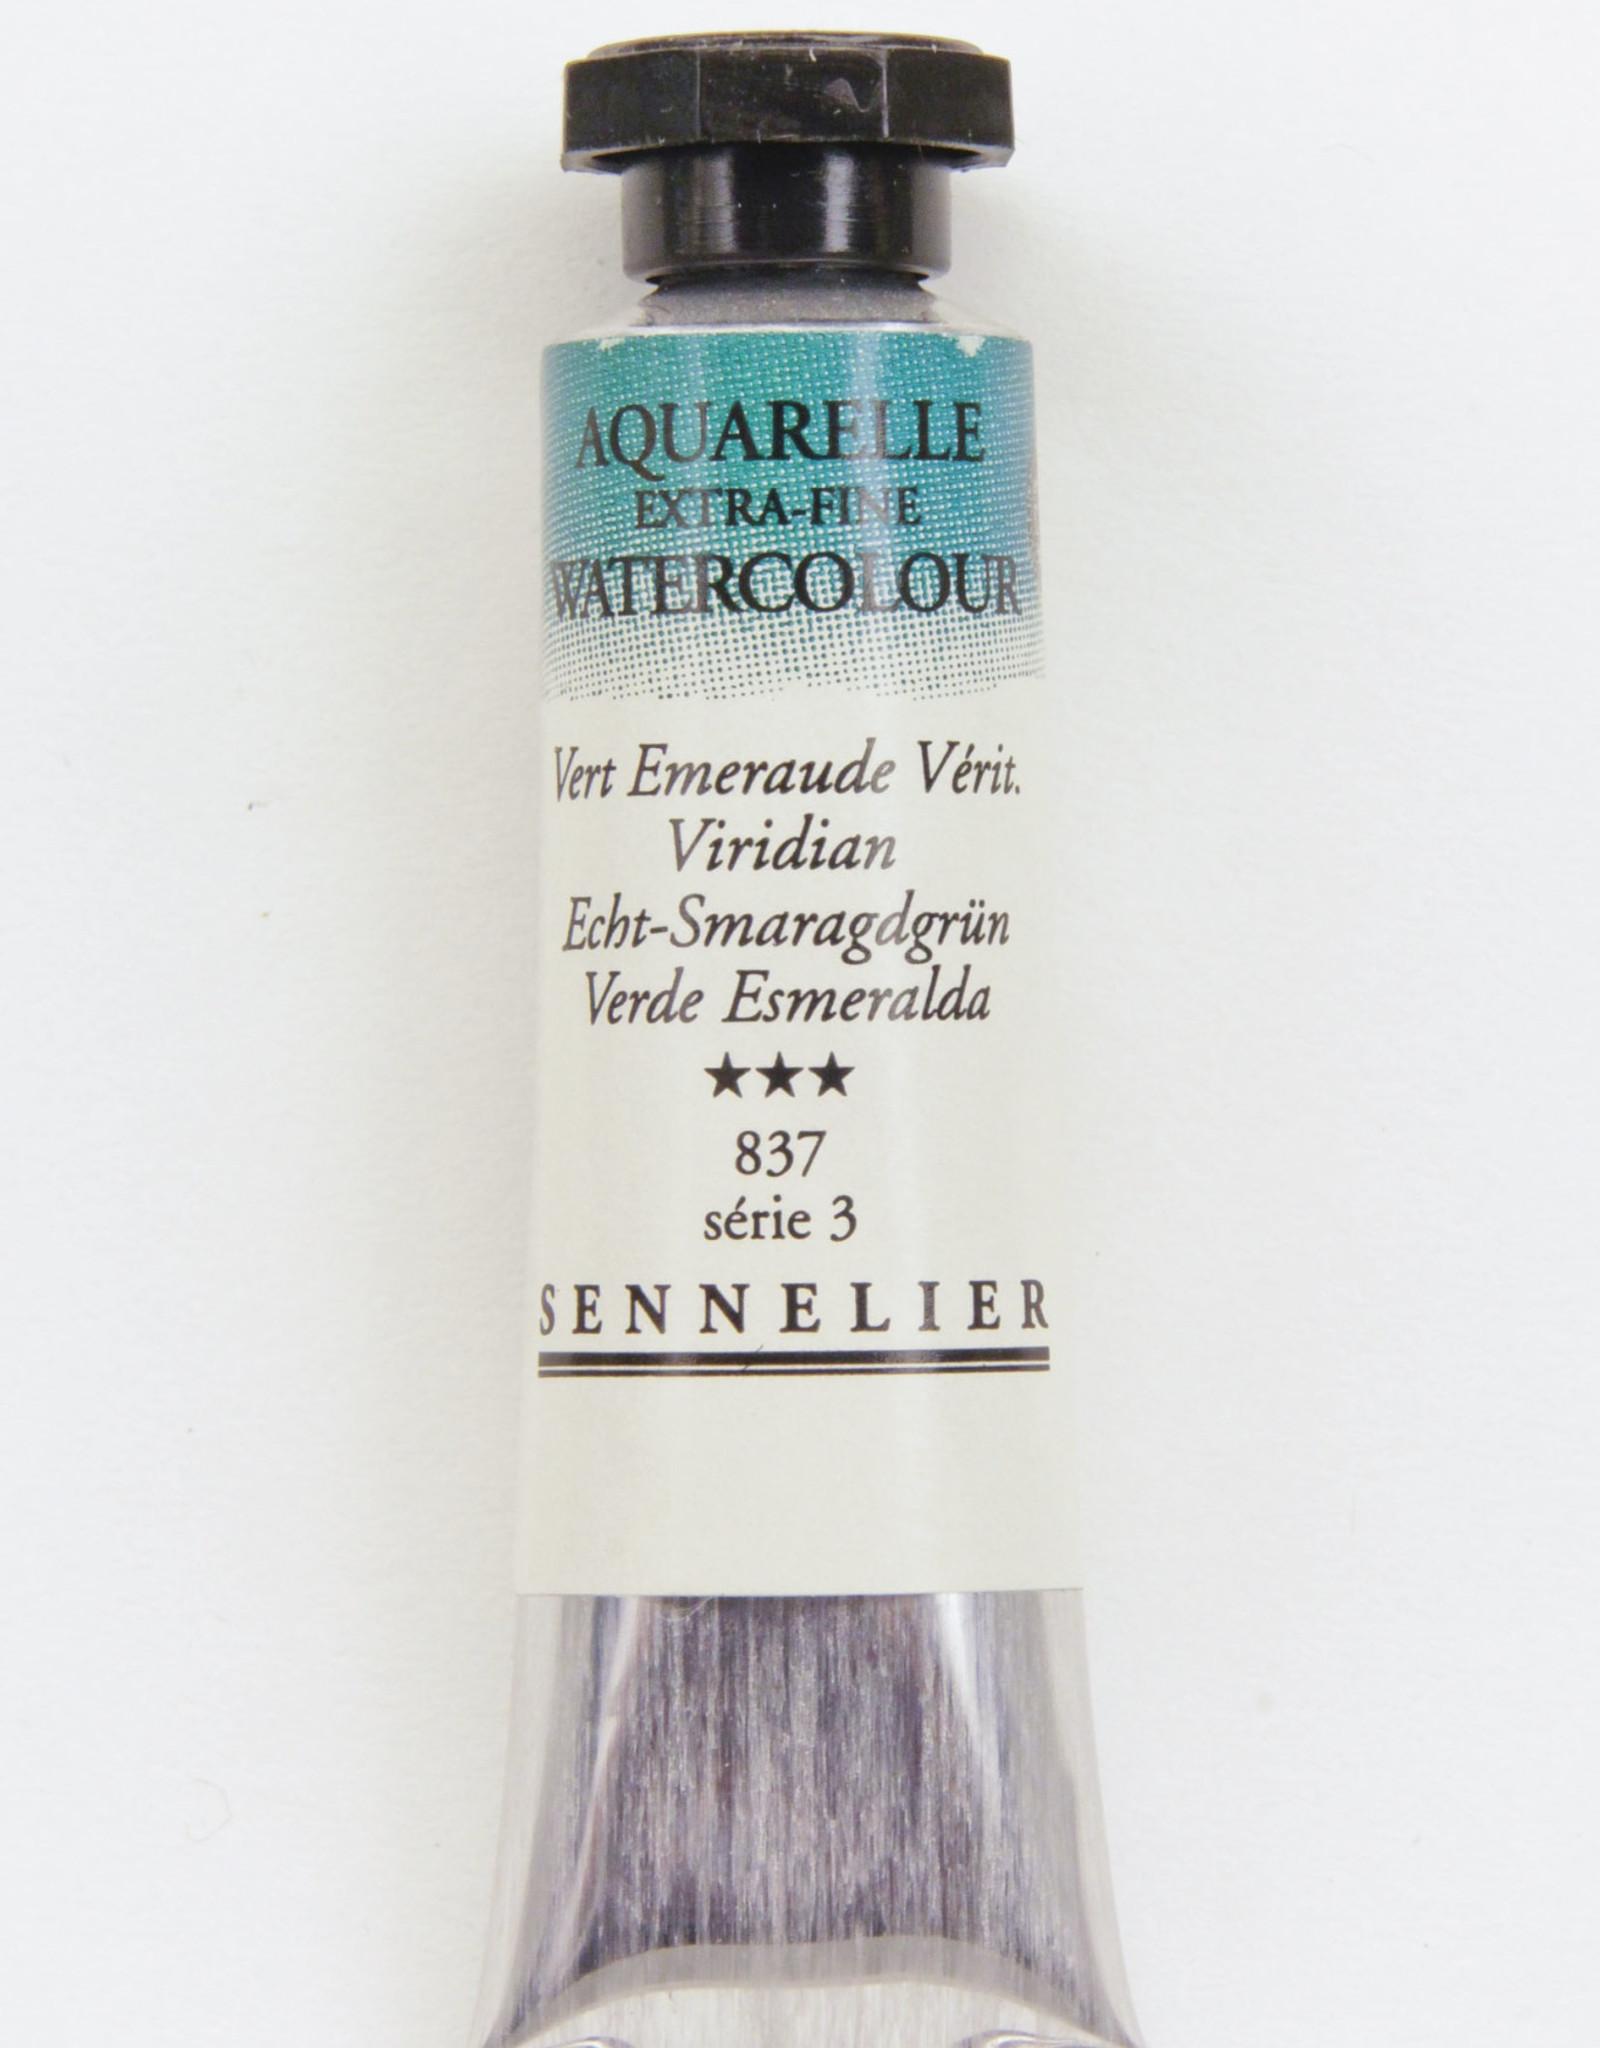 Sennelier, Aquarelle Watercolor Paint, Viridian, 837,10ml Tube, Series 5